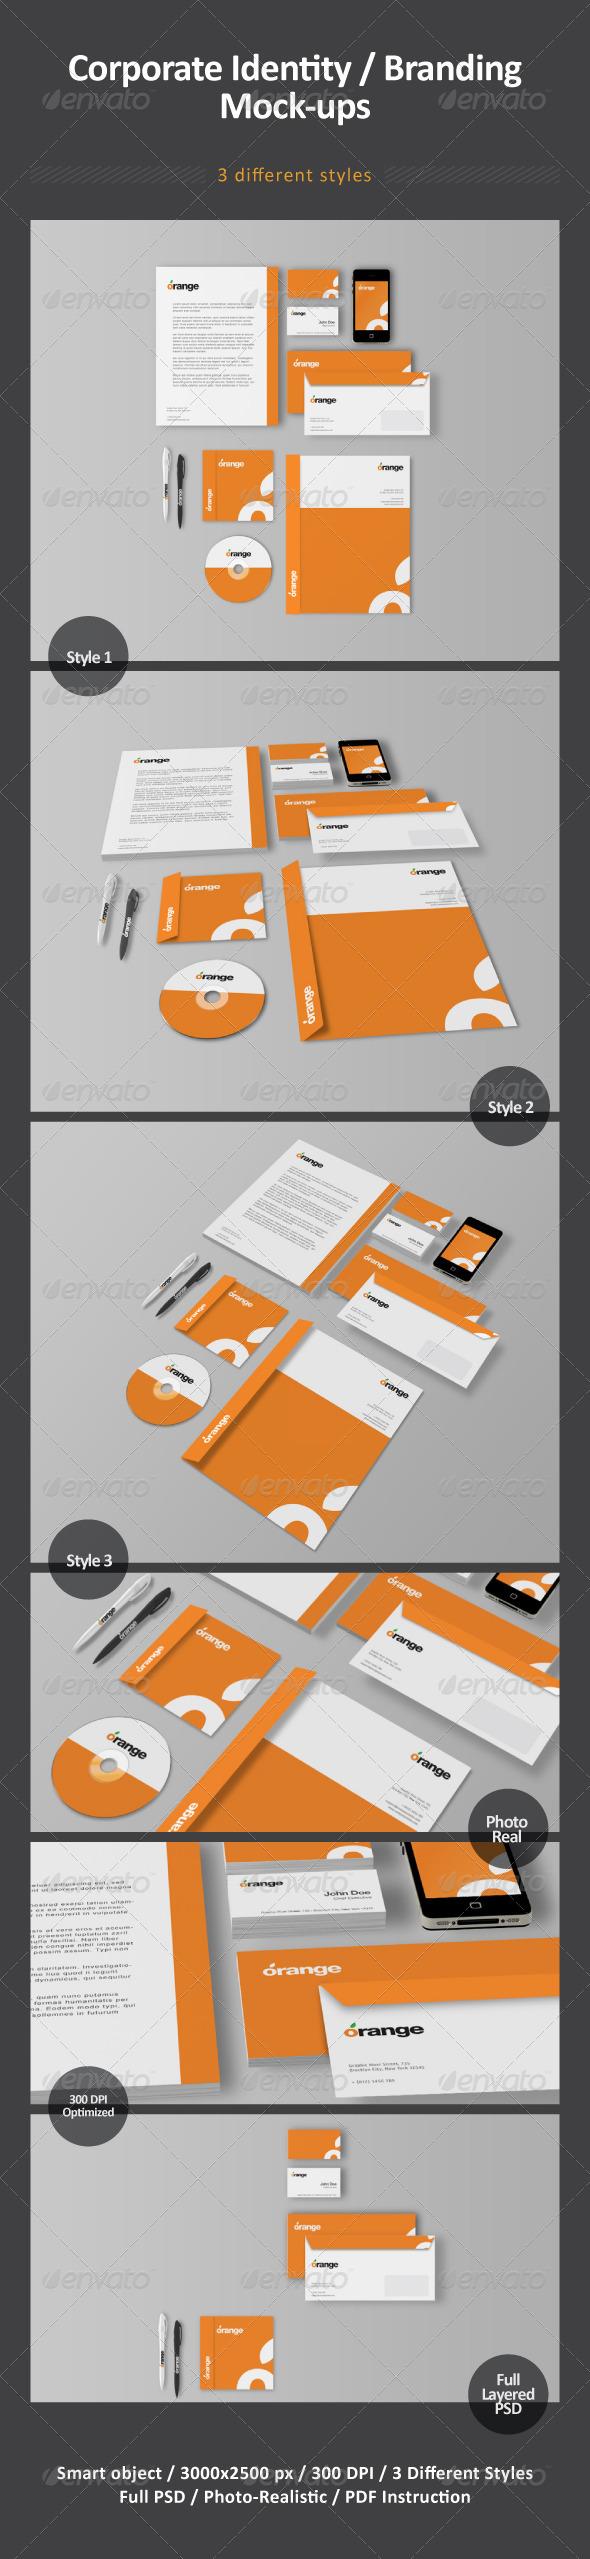 GraphicRiver Corporate Identity Branding Mock-ups 2453625